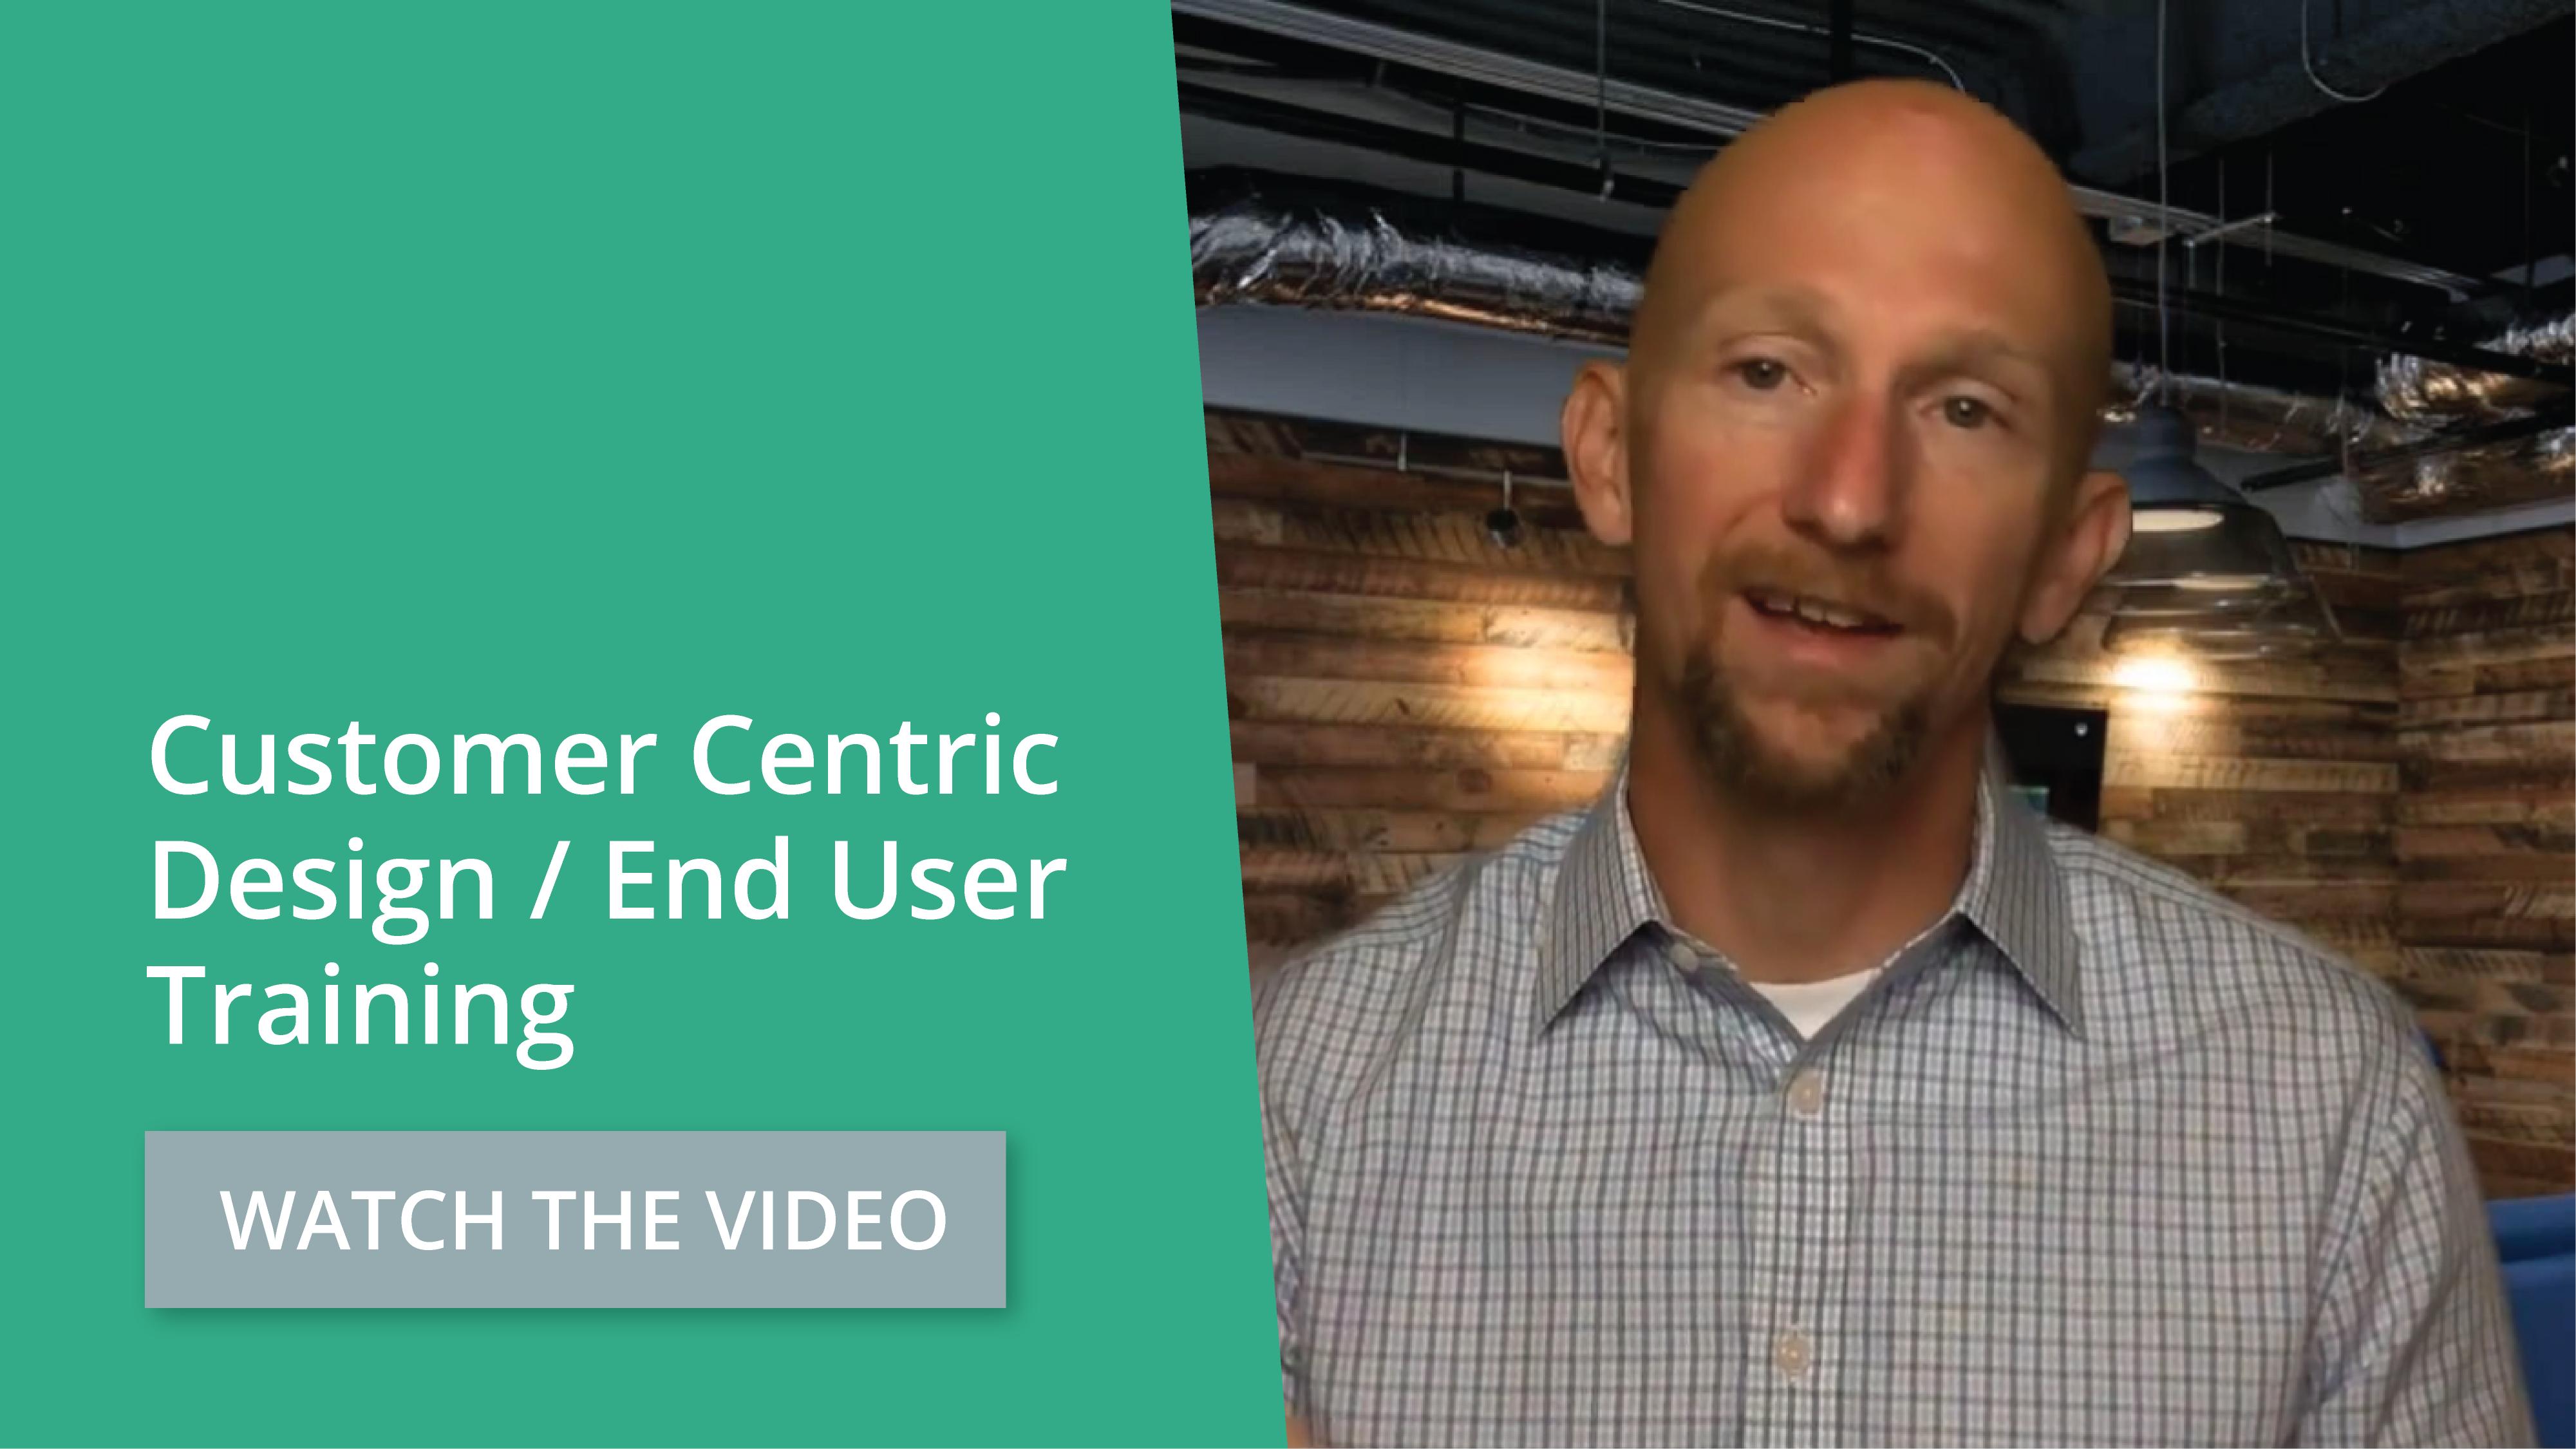 MMMM #45 - Customer Centric Design / End User Training